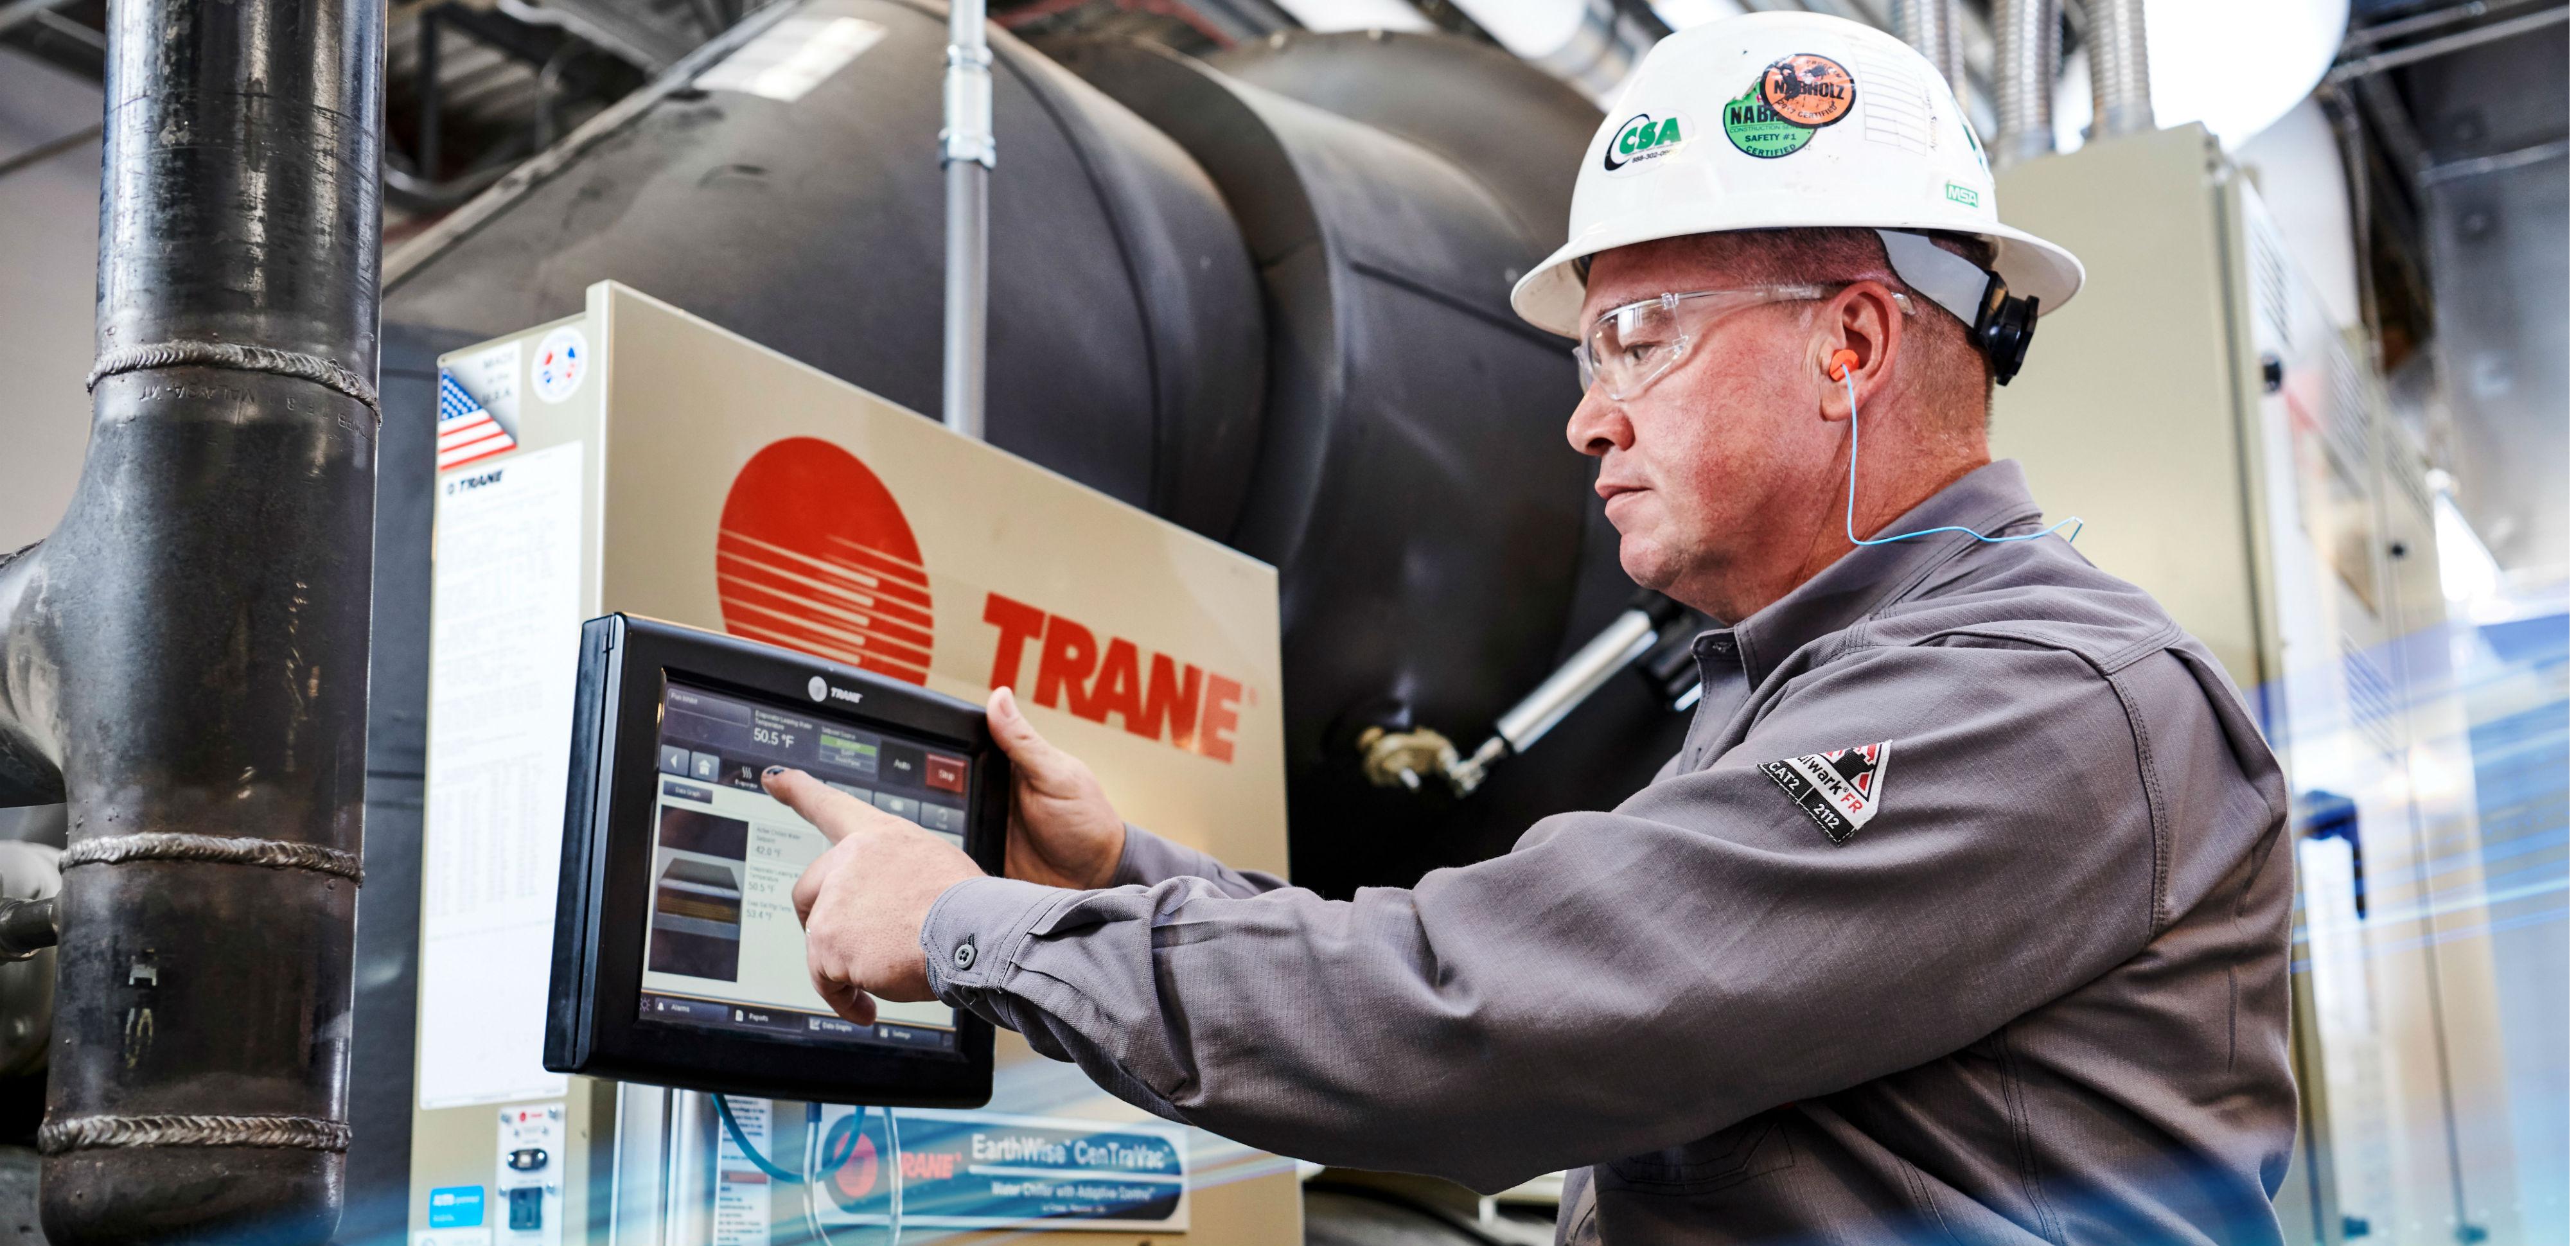 Trane Chiller System Upgrades Trane Commercial